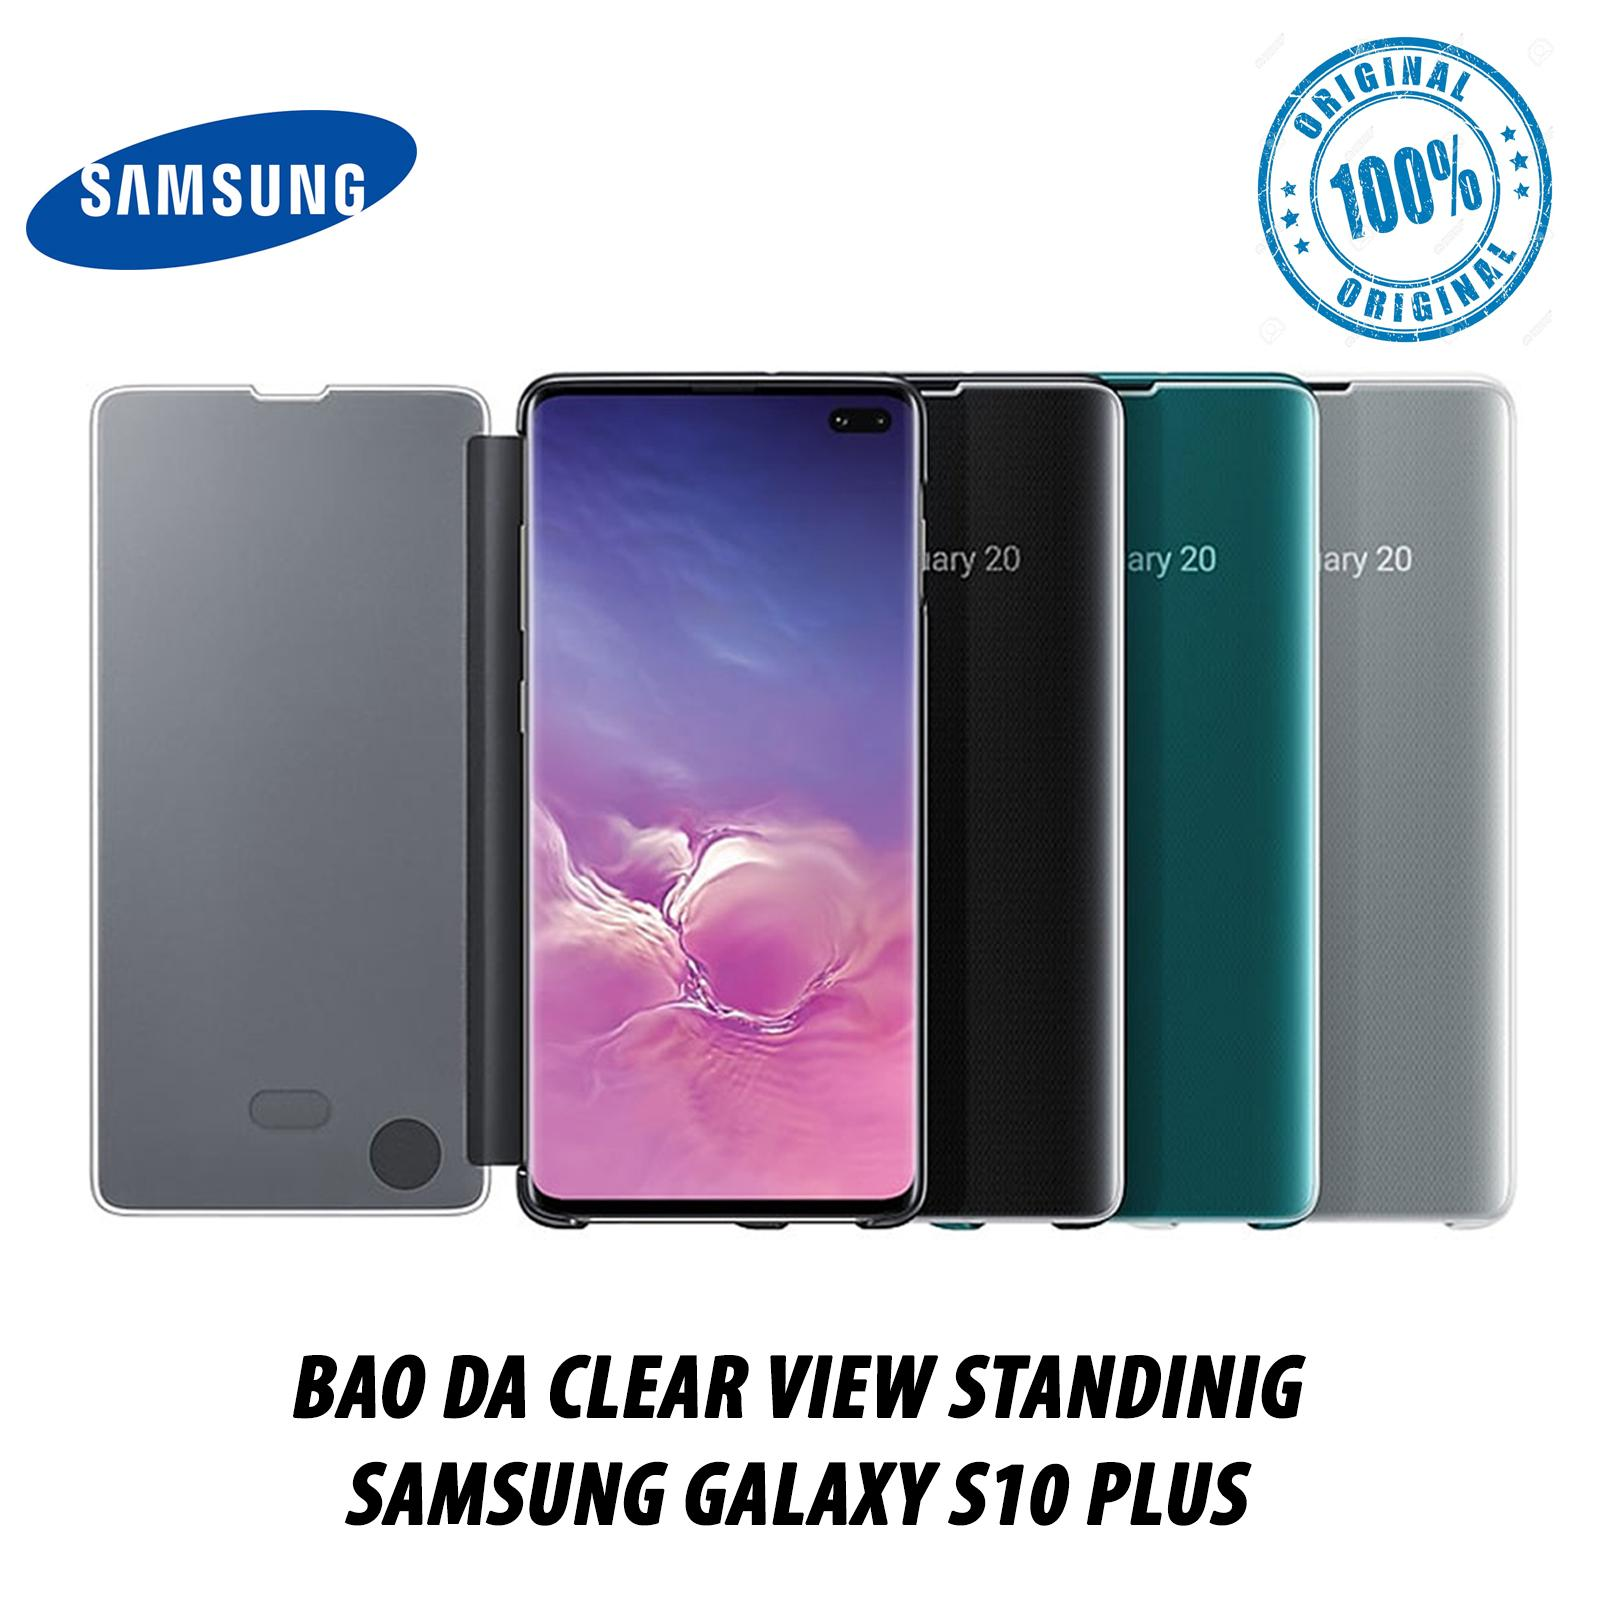 Offer Ưu Đãi Bao Da Clear View Standing Samsung Galaxy S10 Plus